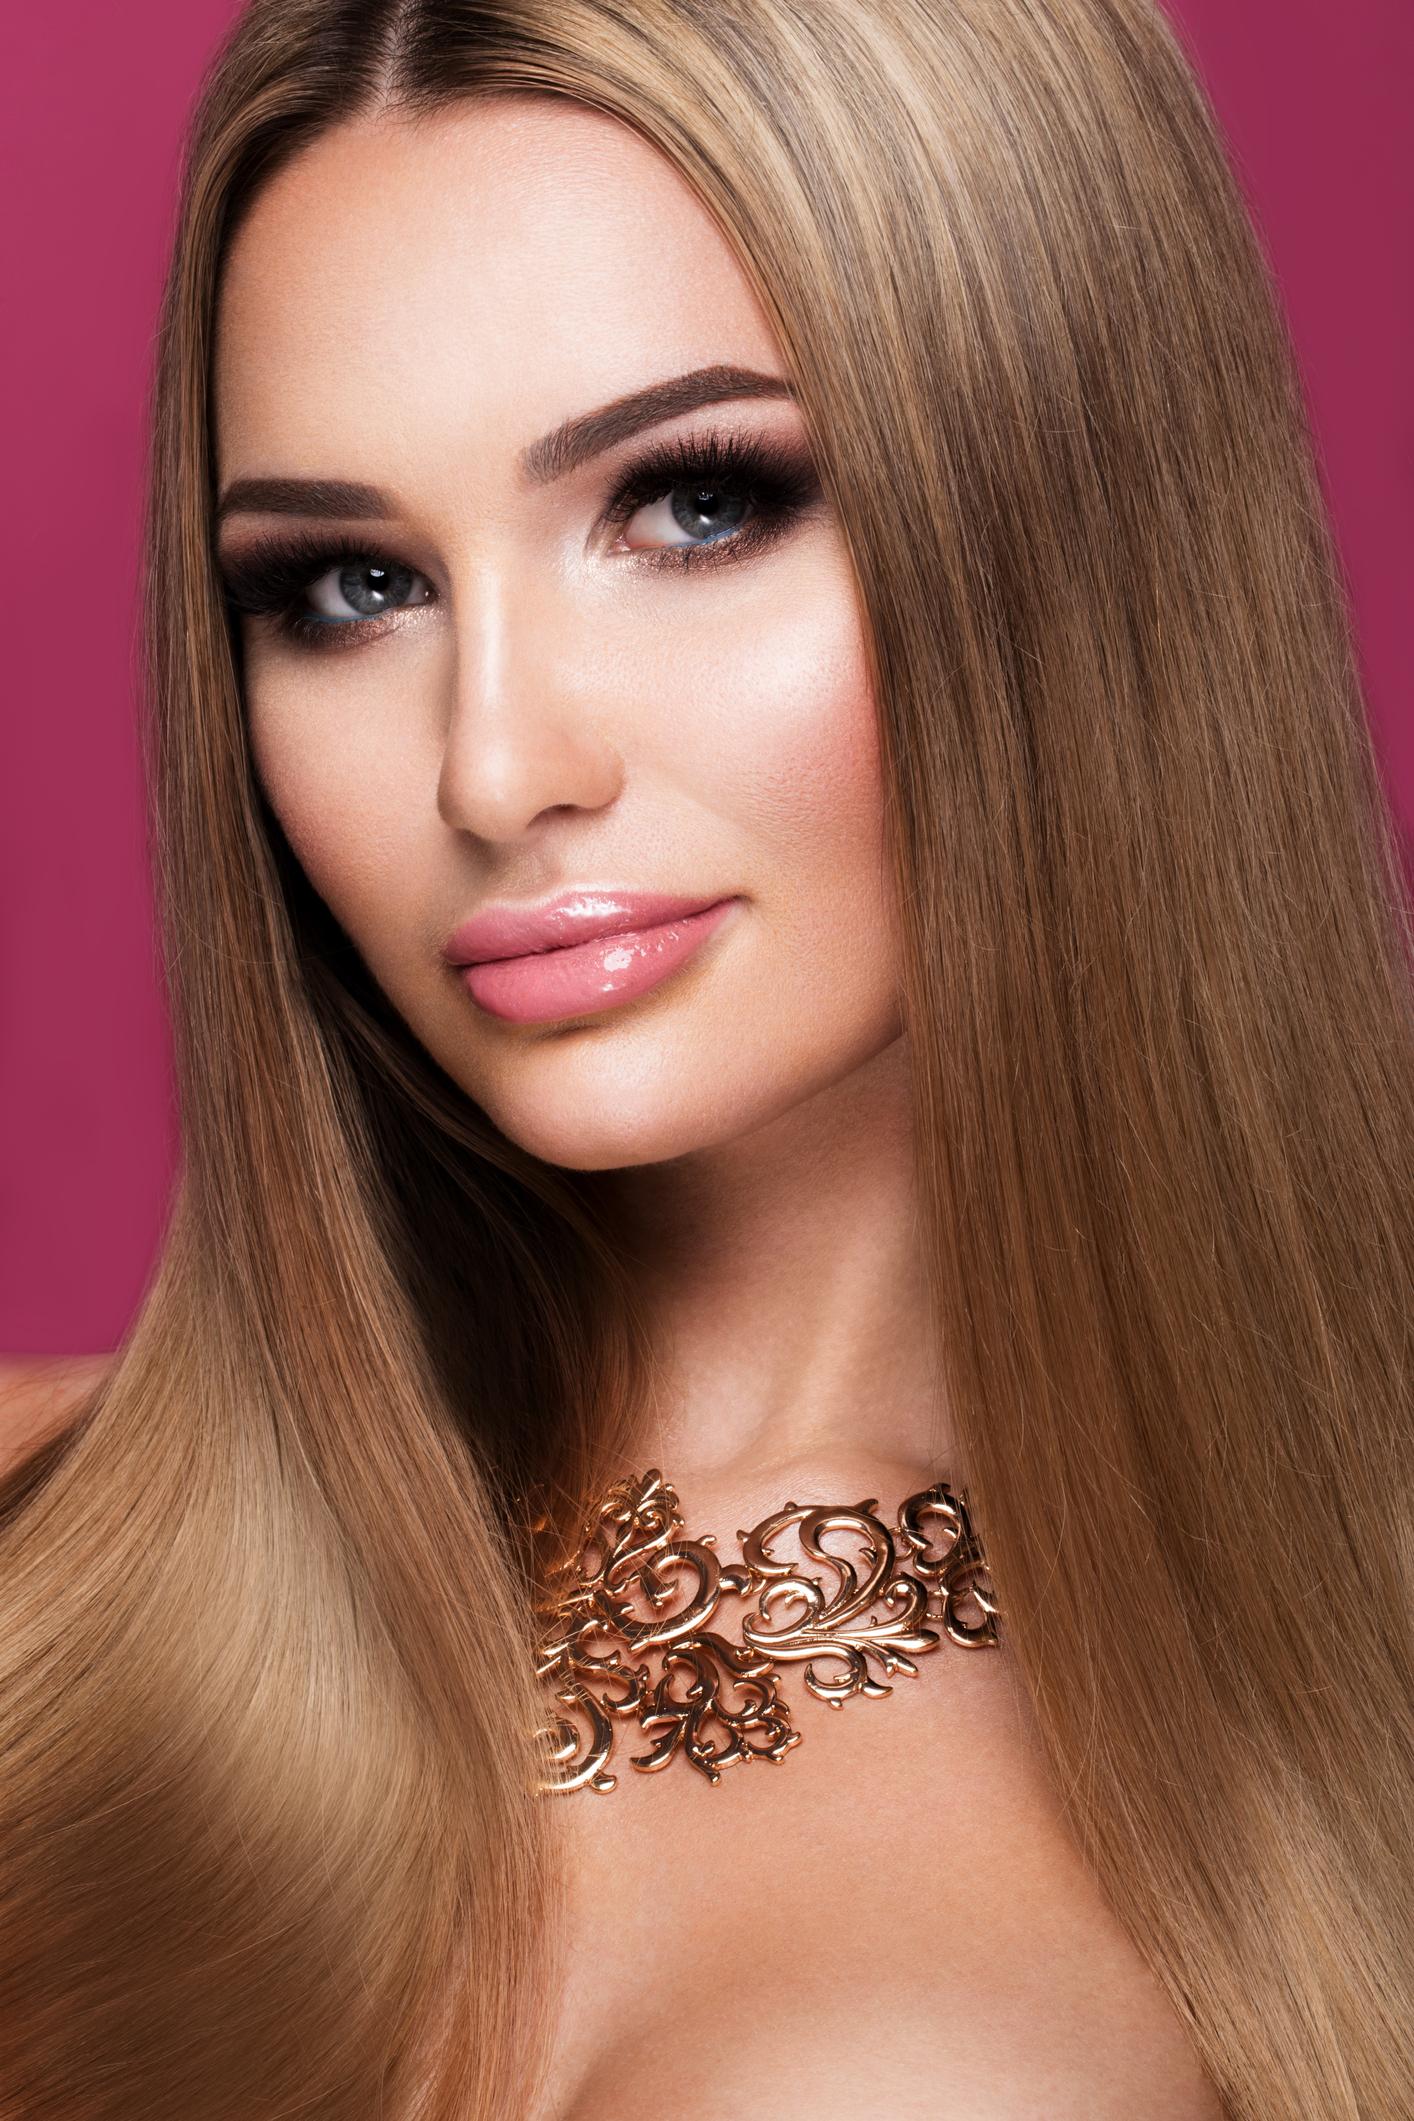 beauty-model-straight-hair-203.jpg